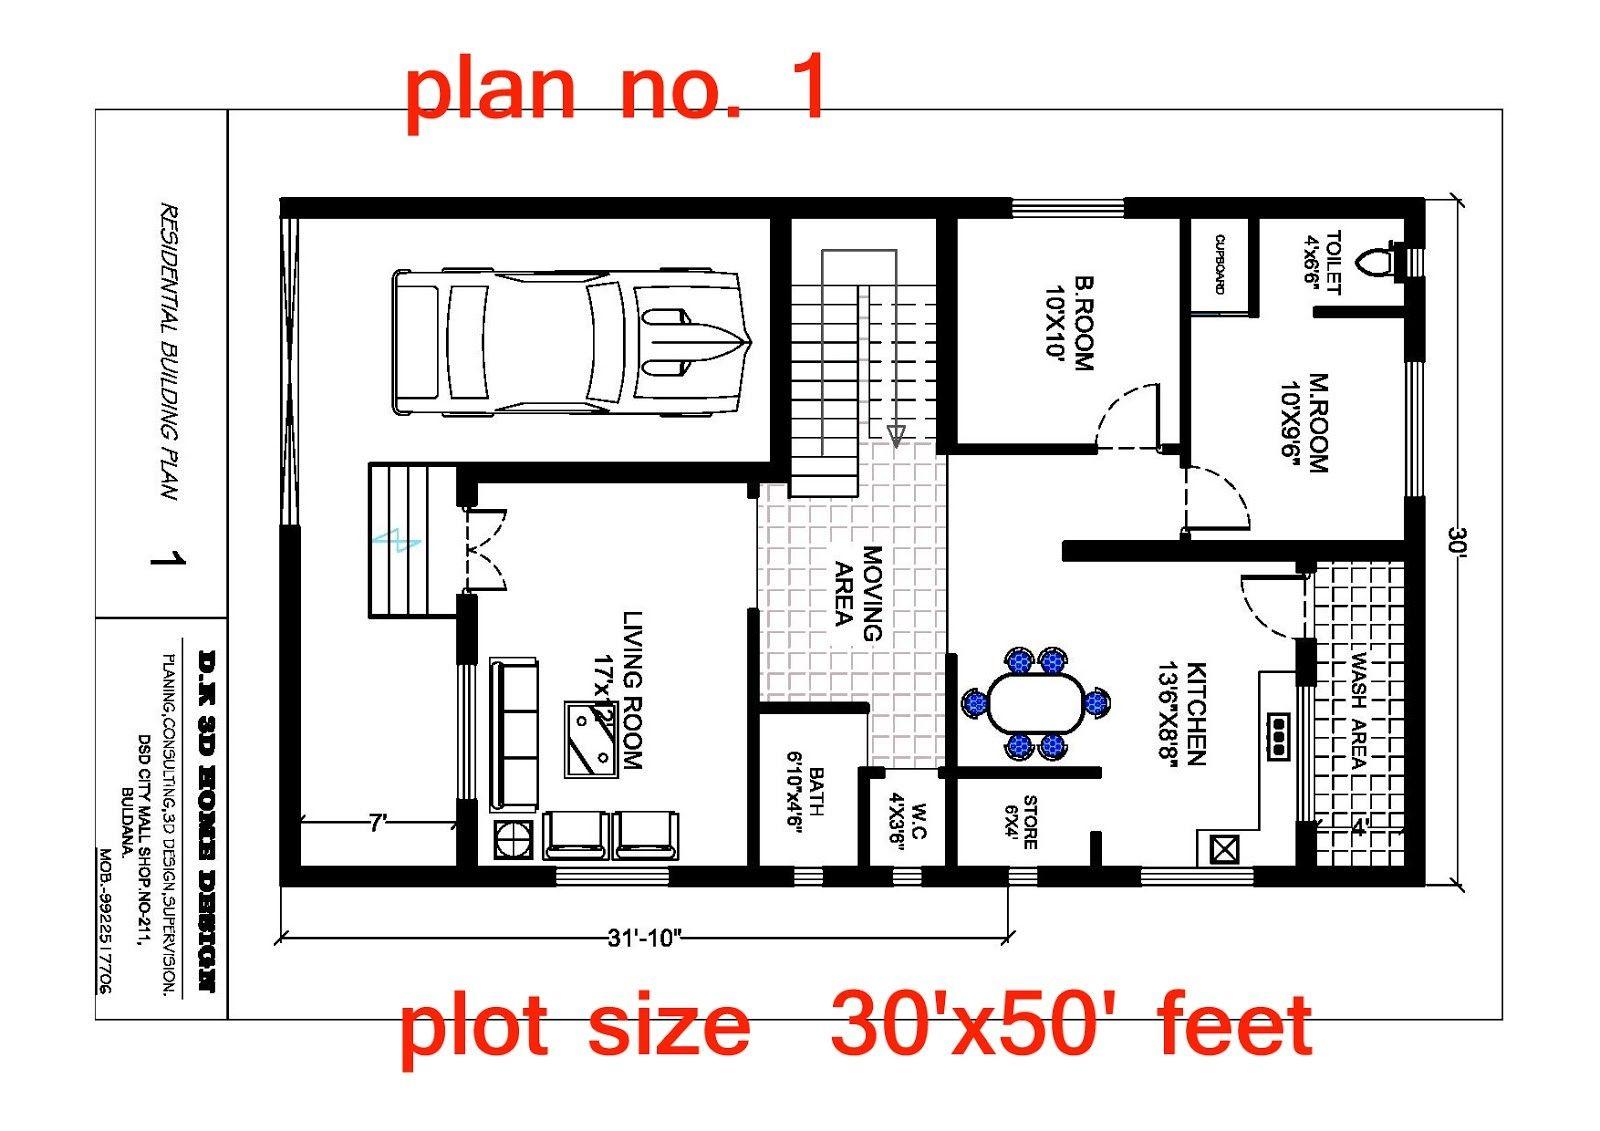 Best 2 Bedroom House Plan Design Ideas Images Home India Cool 30 By 50 2 Bedroom House Plans Bedroom House Plans House Plans